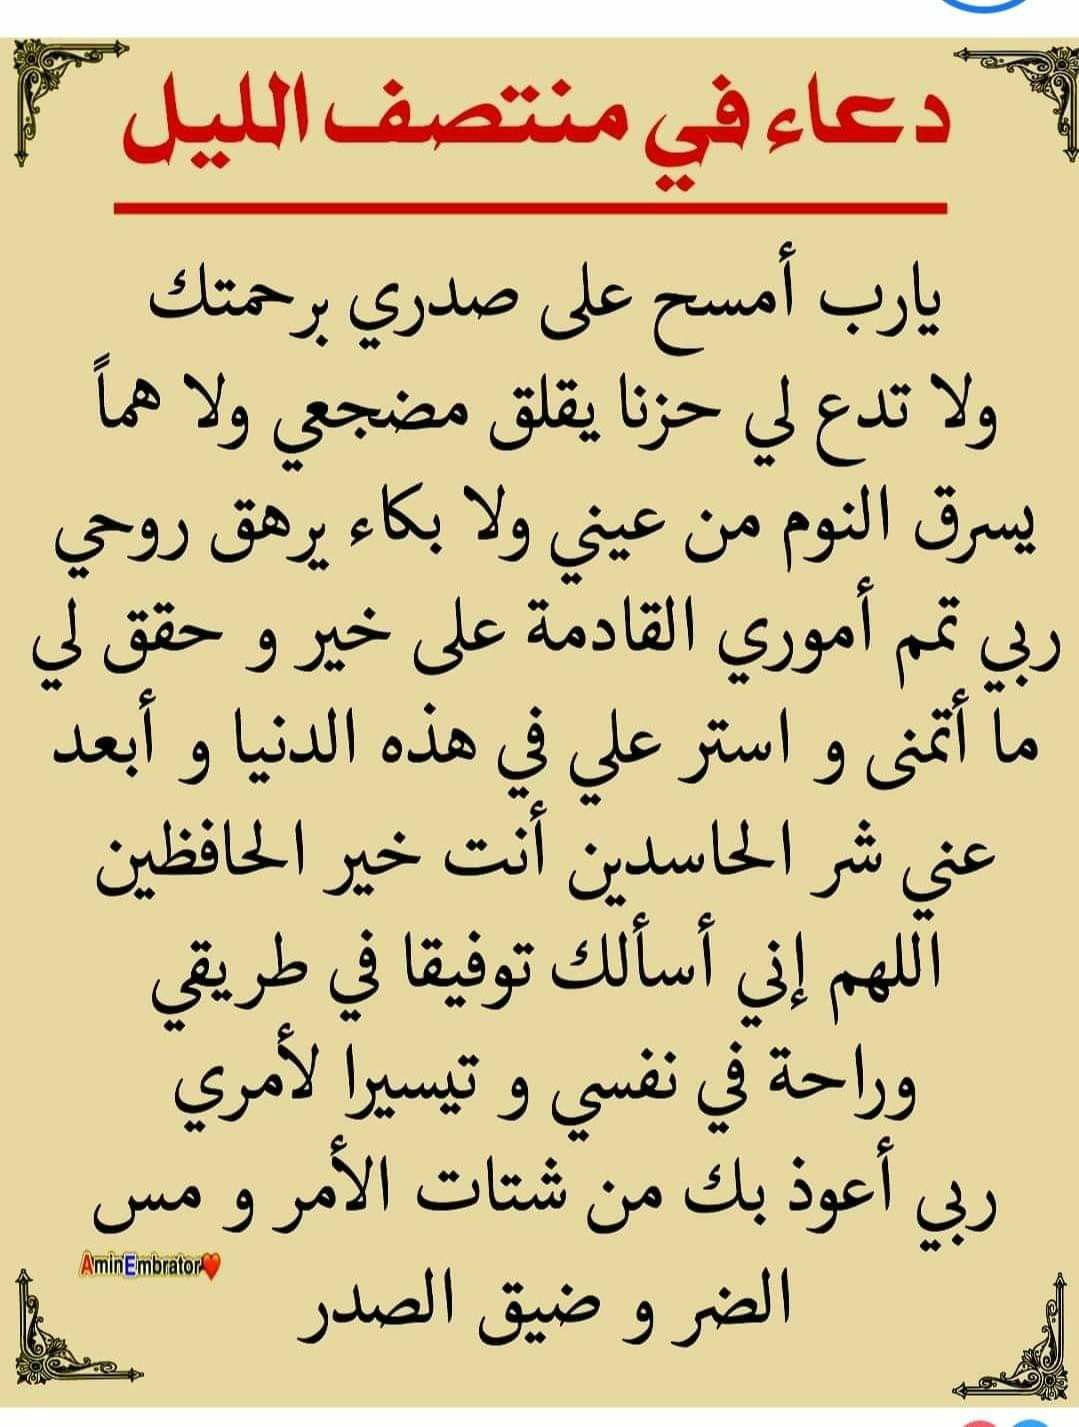 Pin By On I Love Allah Quran Islam The Prophet Miracles Hadith Heaven Prophets Faith Prayer Dua حكم وعبر احاديث الله اسلام قرآن دعاء Beautiful Quran Quotes Quran Quotes Muslim Quotes